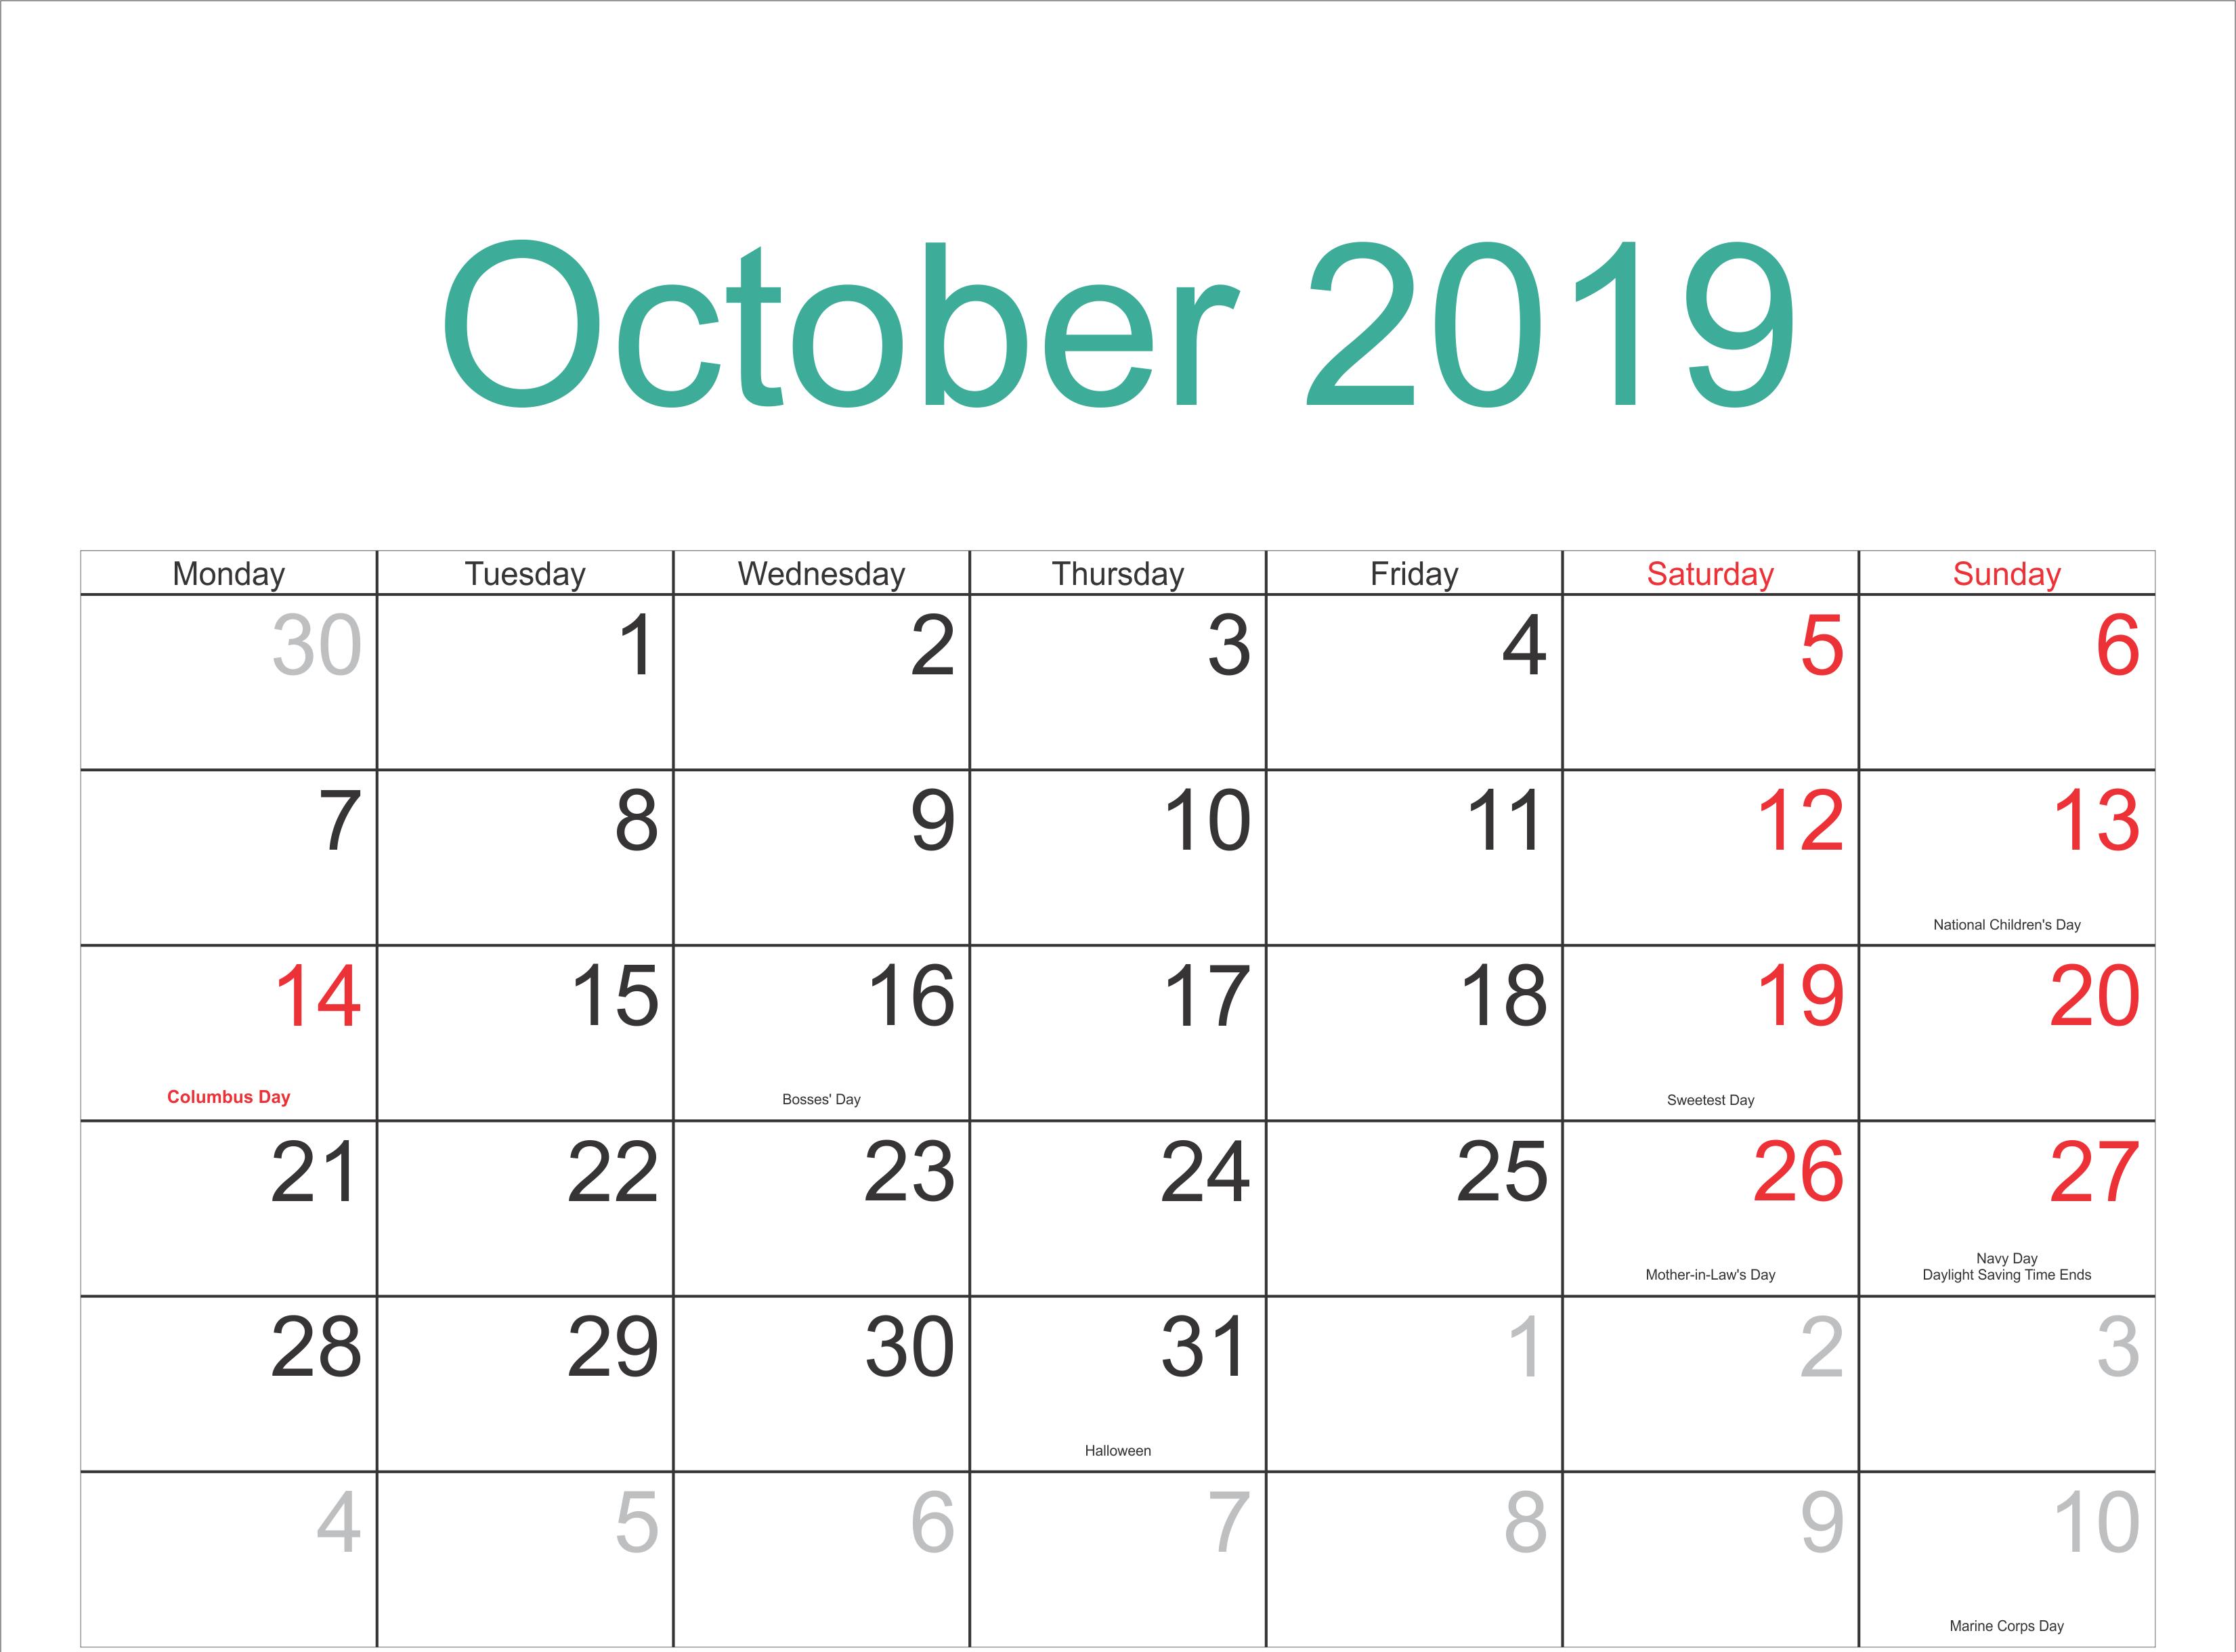 October 2019 Calendar With Holidays Template | October inside October 2020 Printable Planning Calendar In Portrait